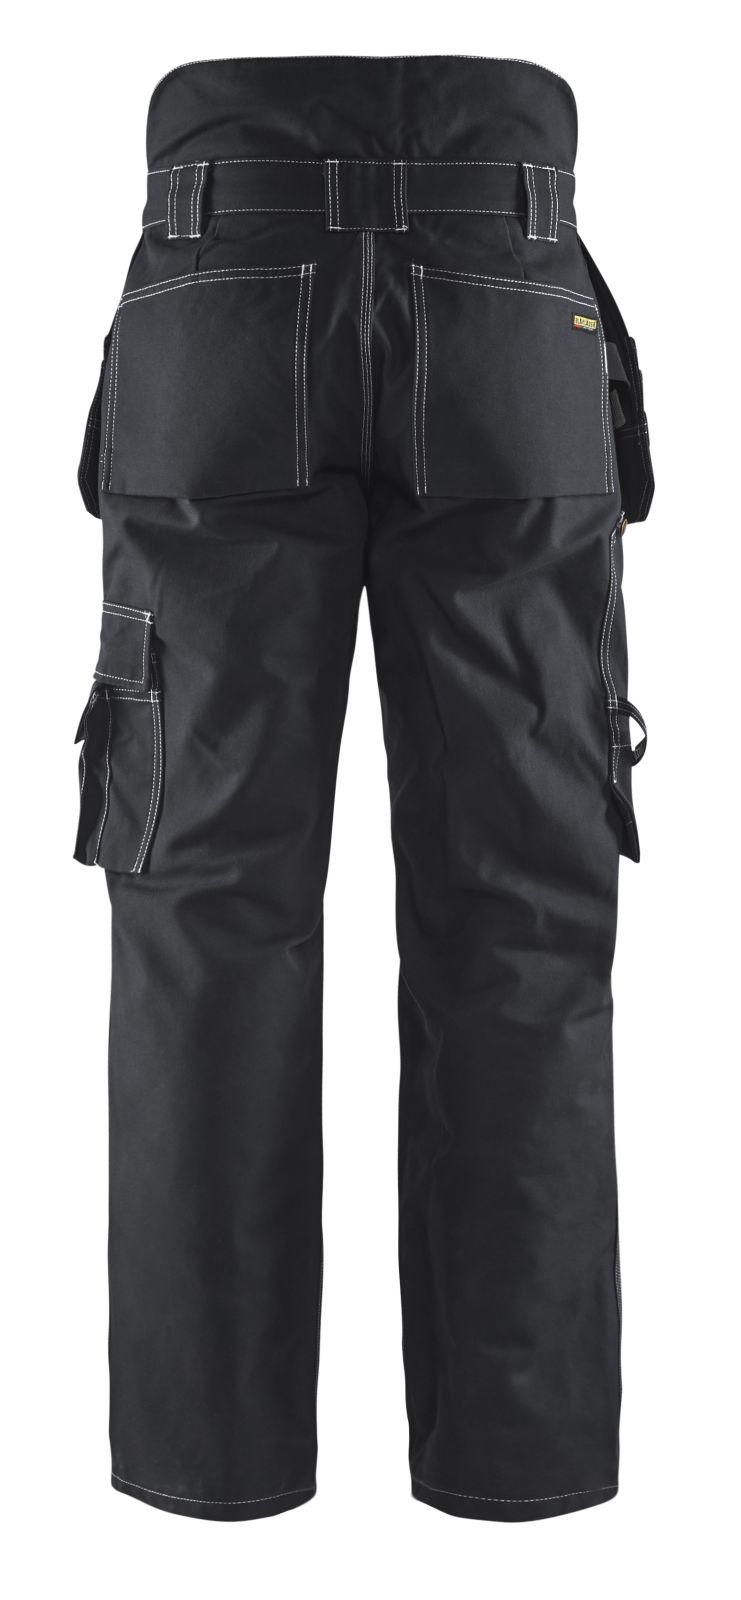 Blaklader Winterbroeken 15151370 zwart(9900)